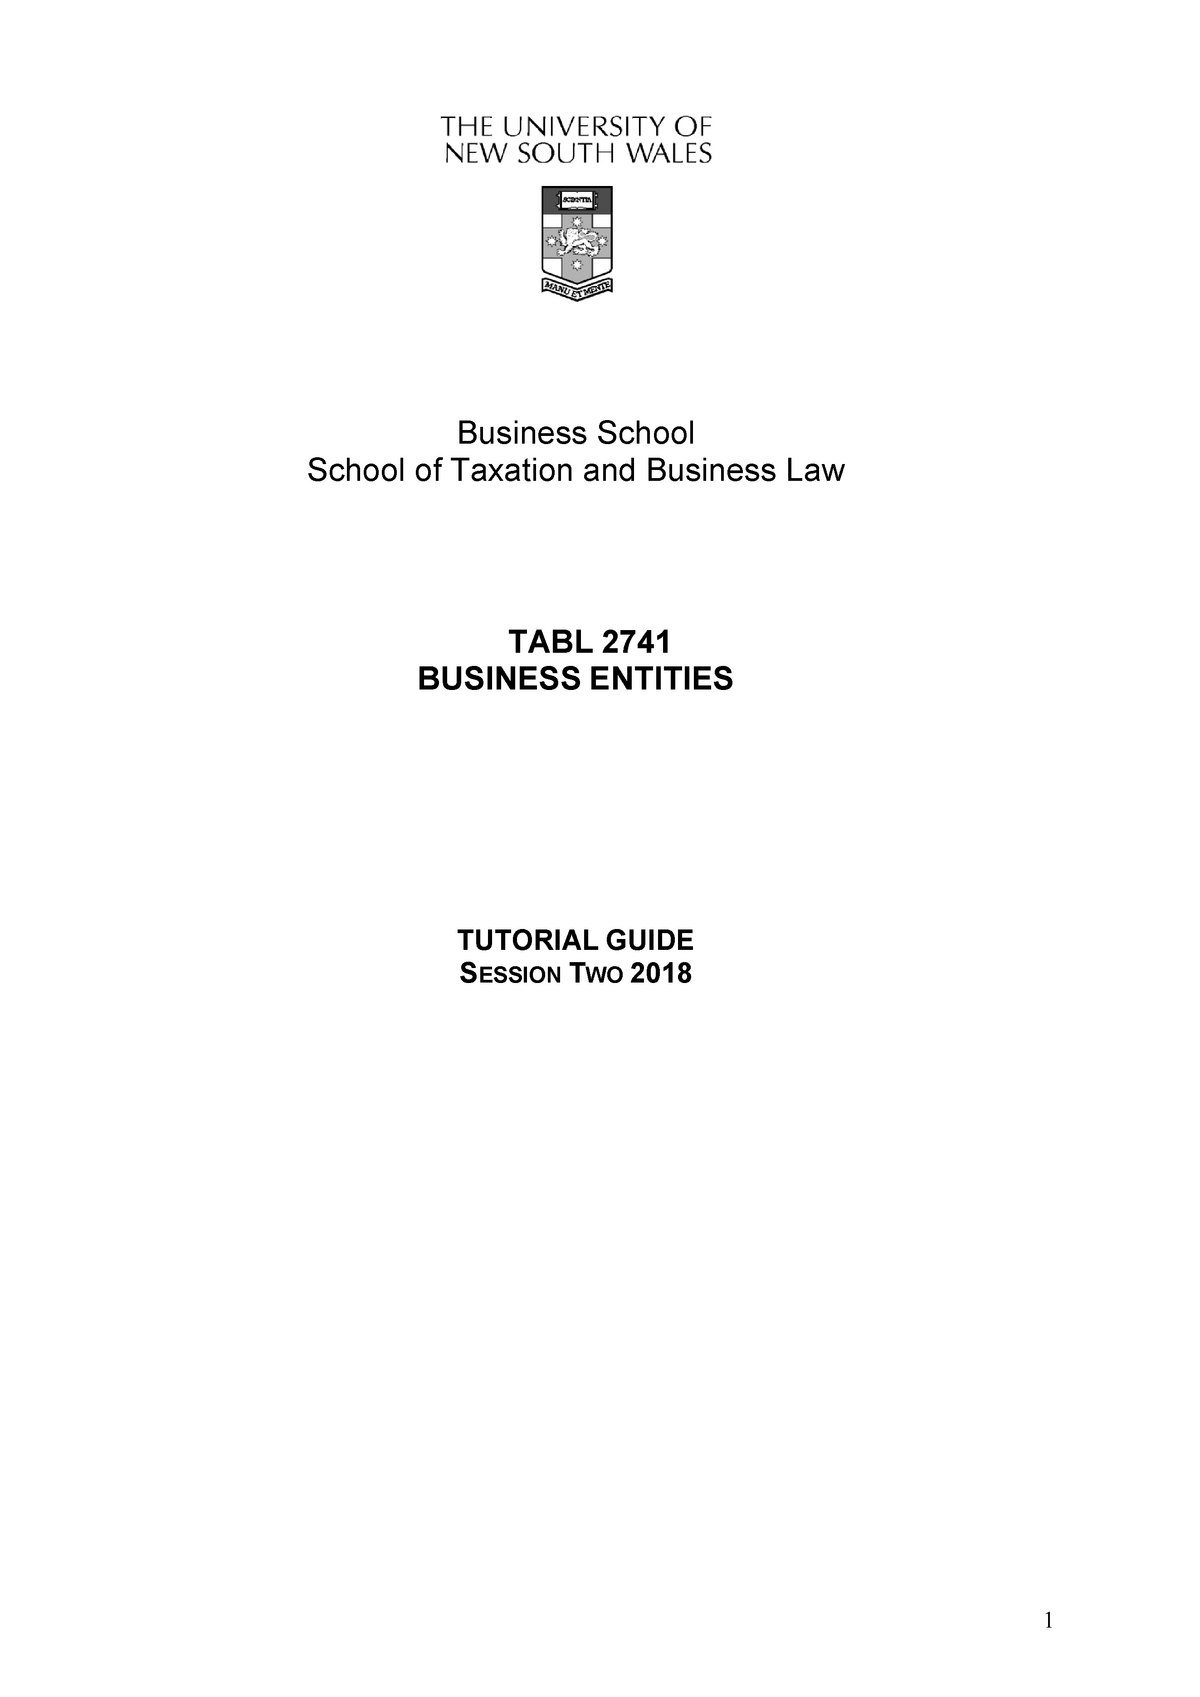 TABL 2741-tutorial program (Session 2 2018 ) - Tabl2741: Law